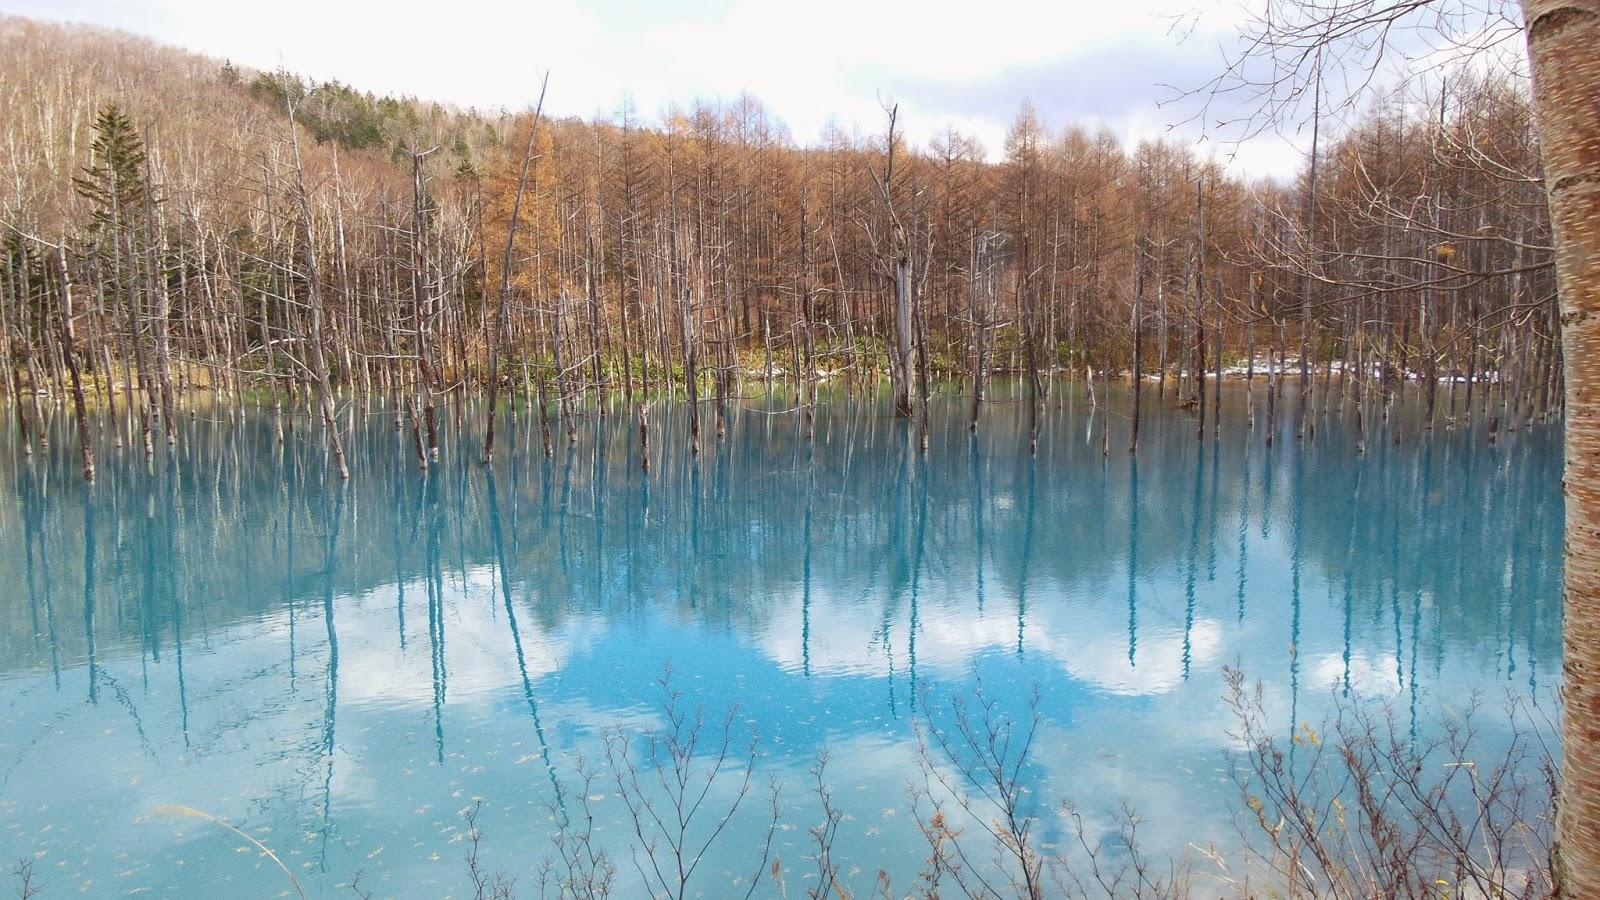 blue lake chatrooms Kutv 2news, salt lake city, ut 374k likes kutv 2news - utah's source for  breaking news, weather and sports.